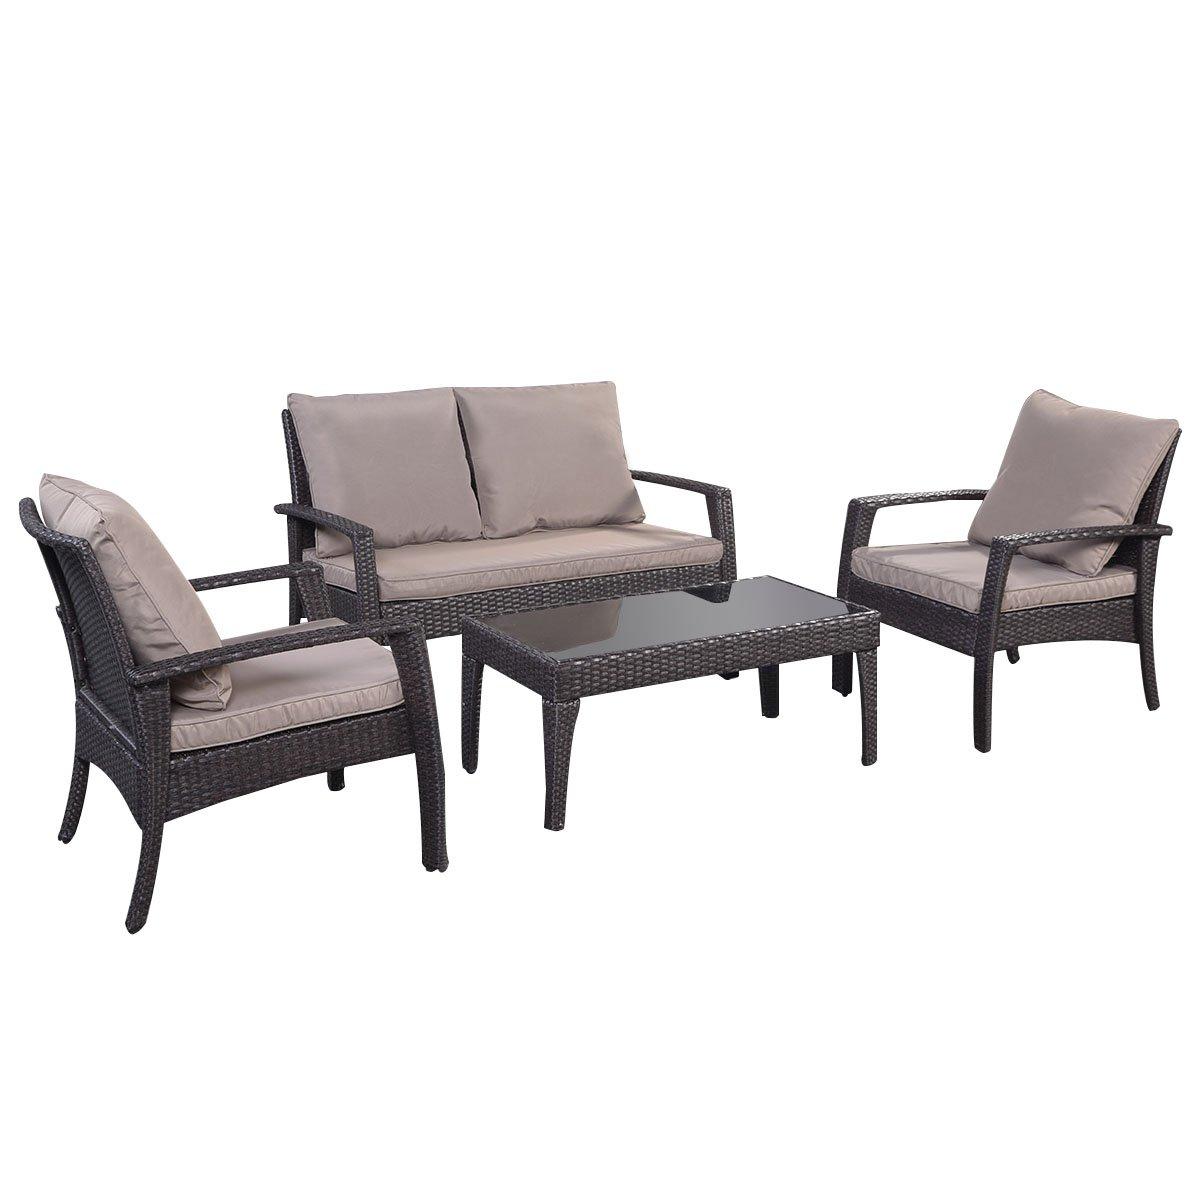 12tlgrattan Set Rattanmöbel Gartenmöbel Lounge Polyrattan